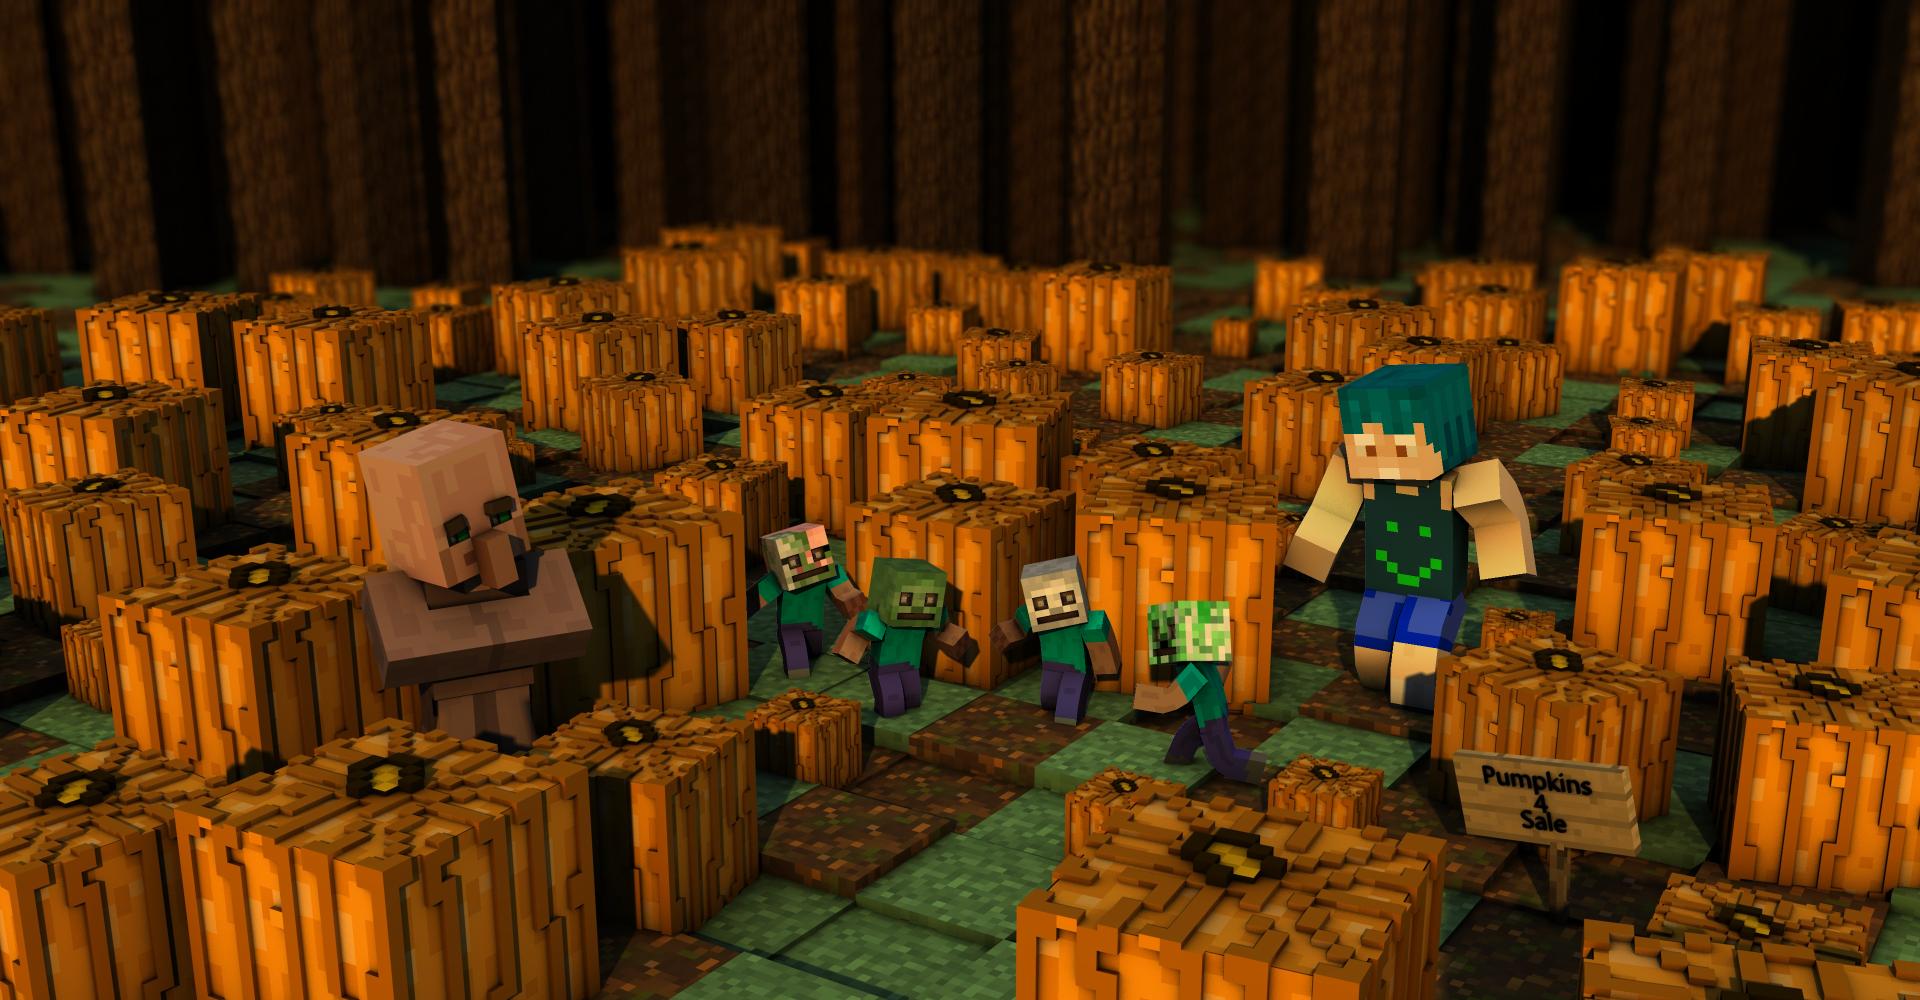 Minecraft Events - Adult Only Minecraft Server | Minecraft Survival Server | Minecraft Server for Adults | TogetherCraft